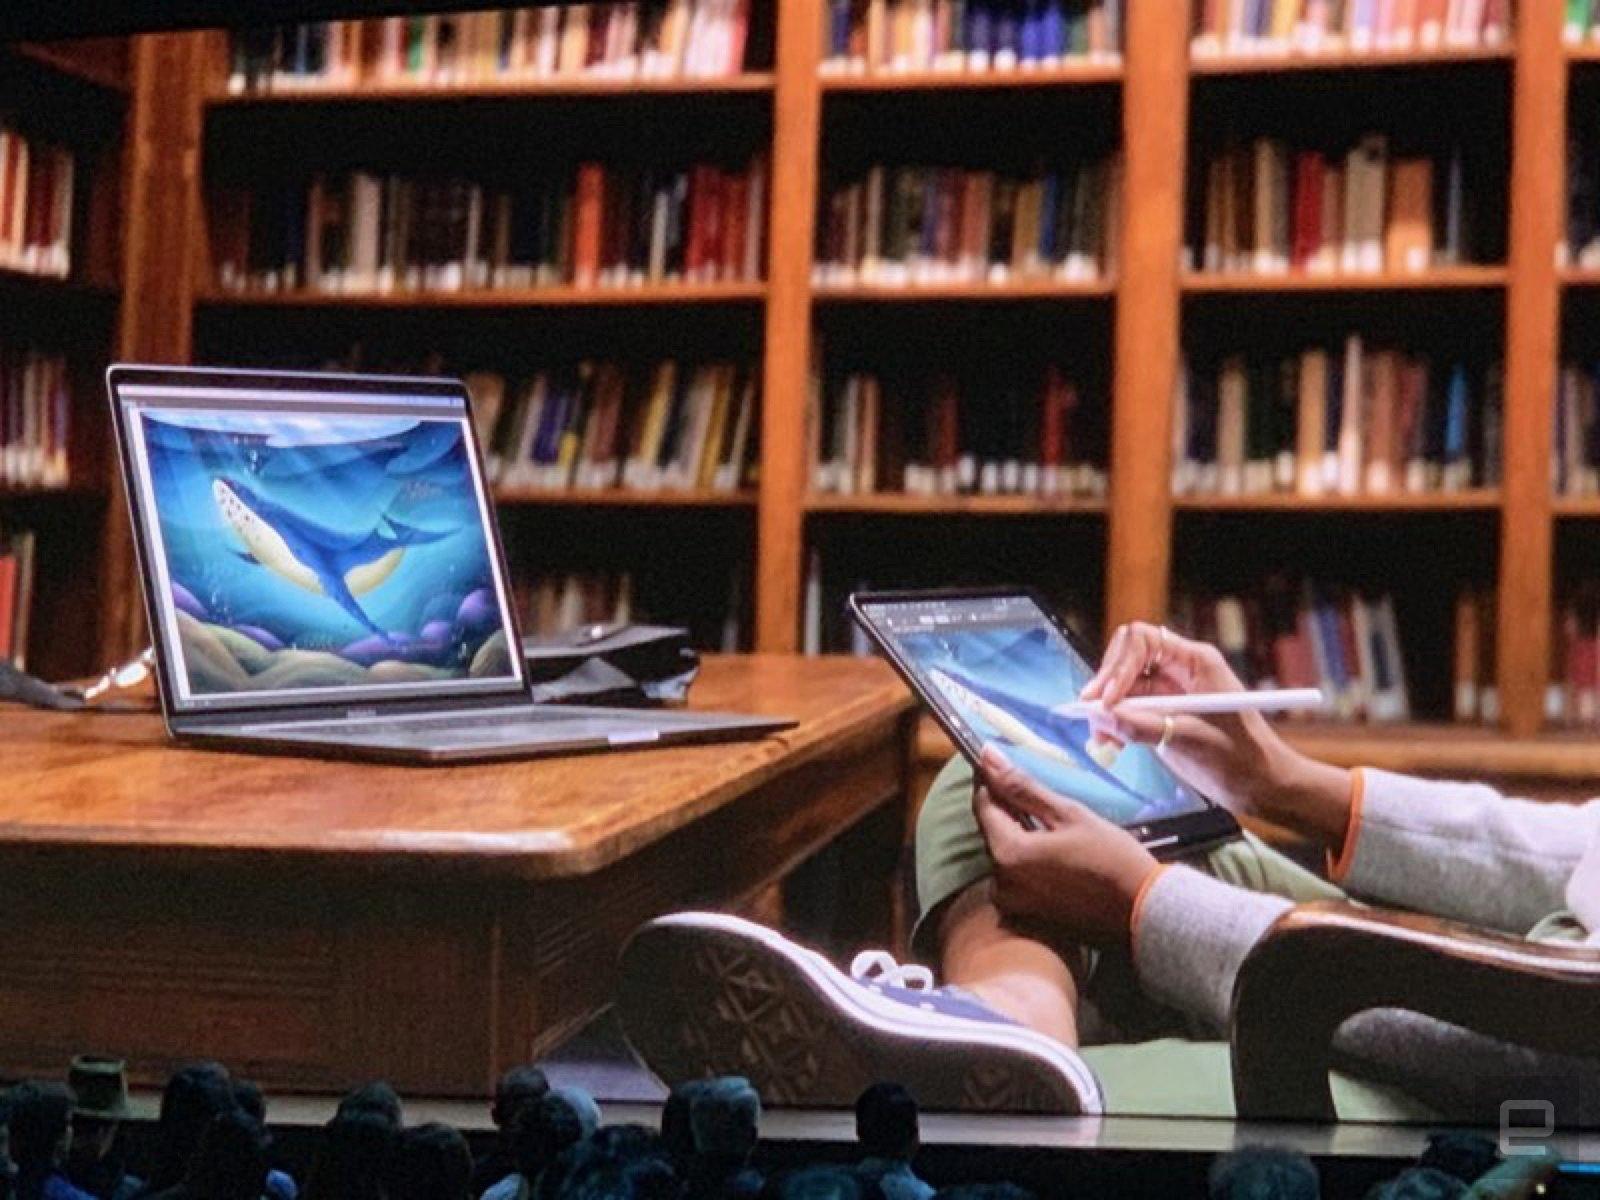 MacOS Catalina is Apples next desktop operating system 1600x1200